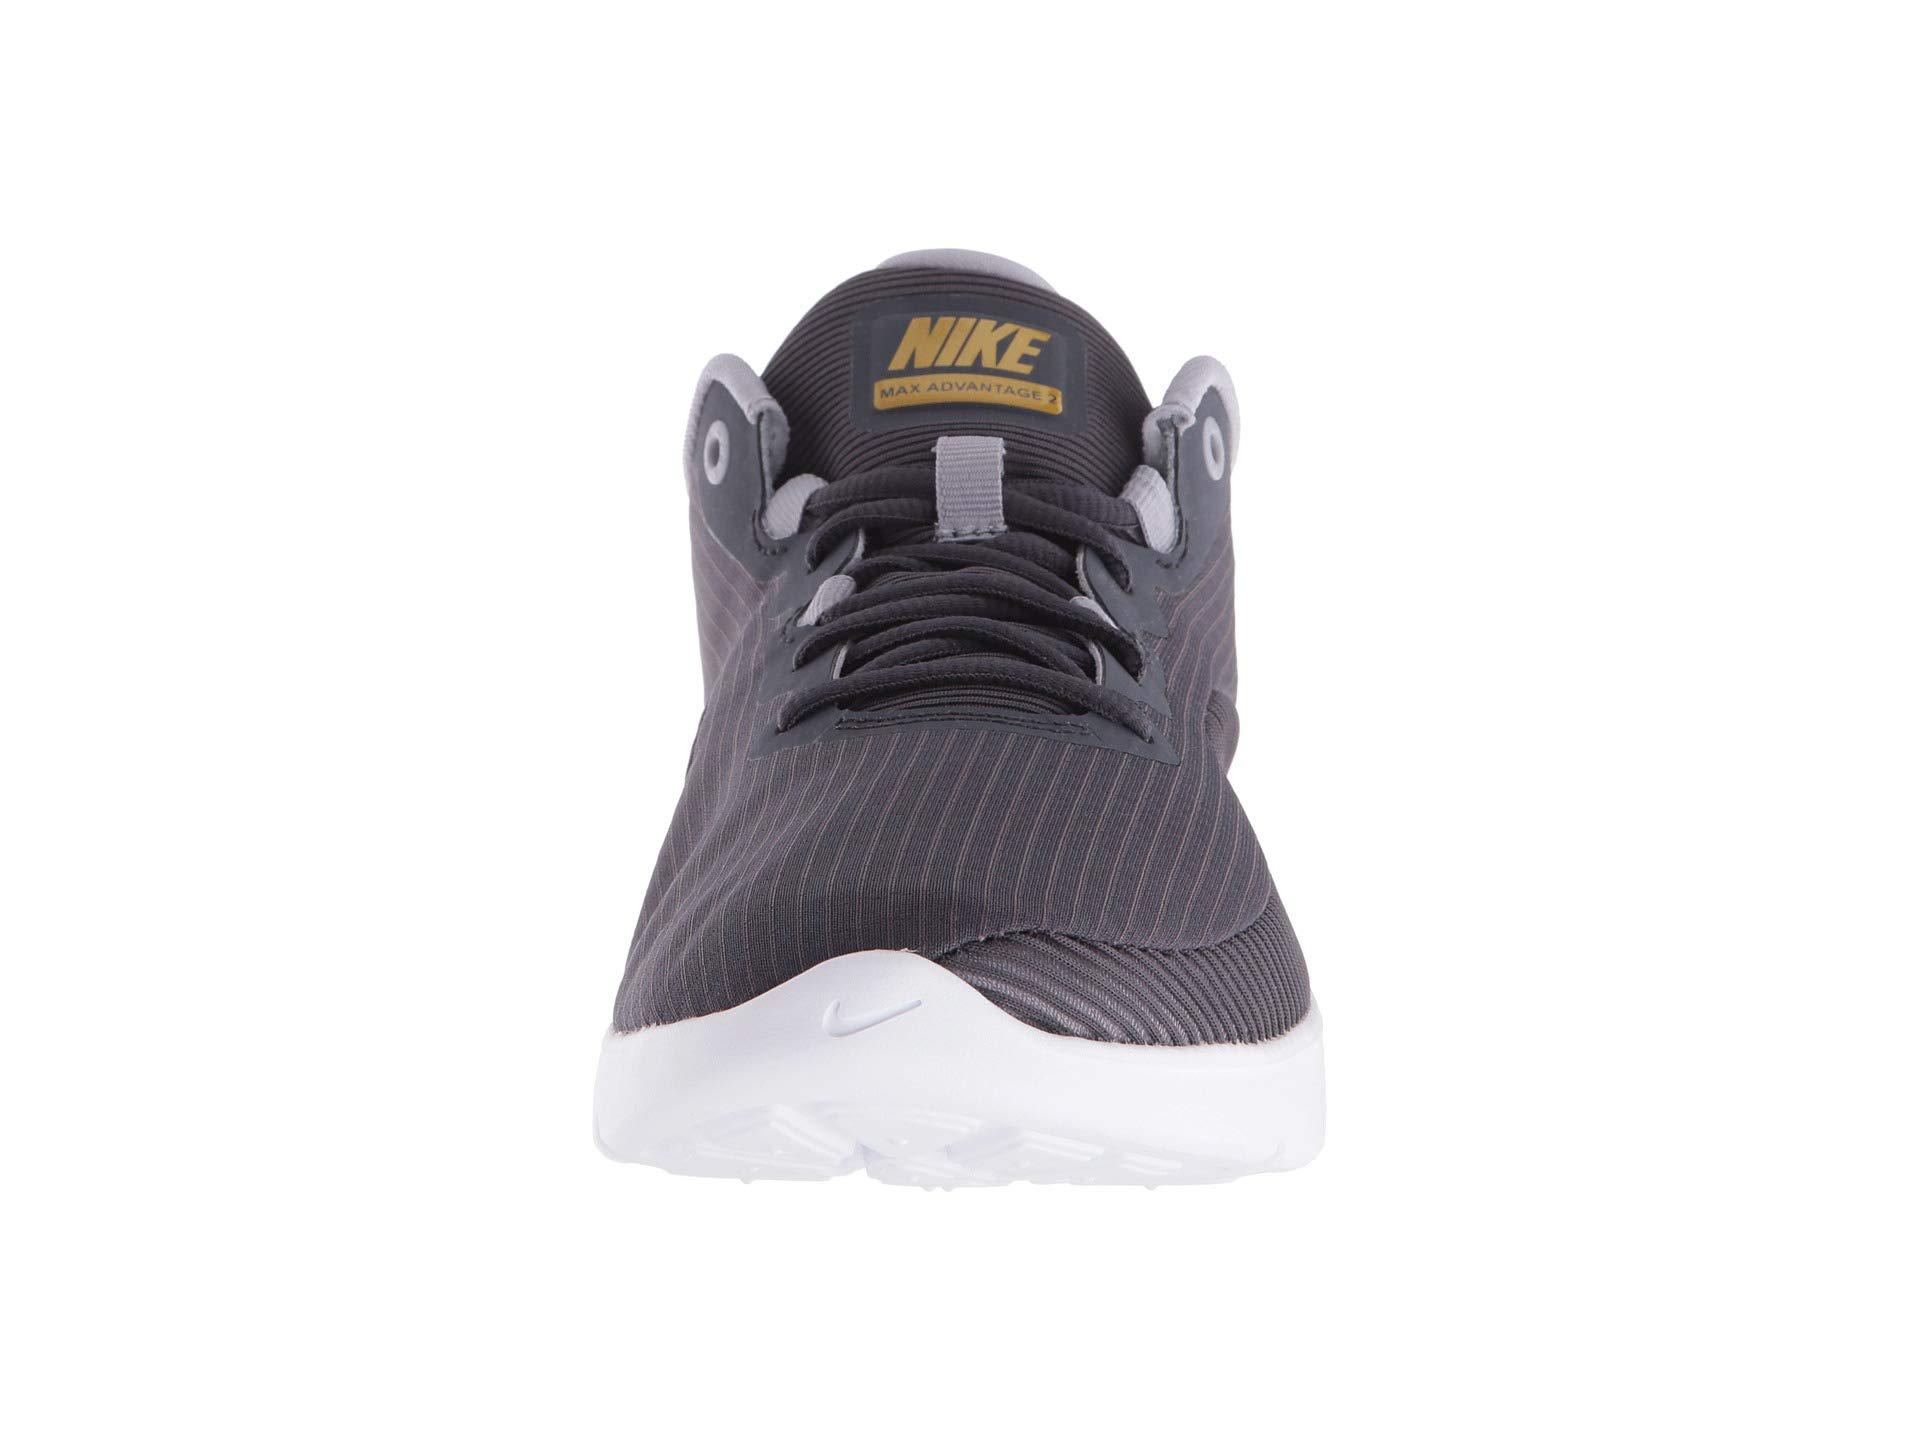 29c64b3ea01 Nike - Multicolor Air Max Advantage 2 (gridiron metallic Pewter provence  Purple). View fullscreen